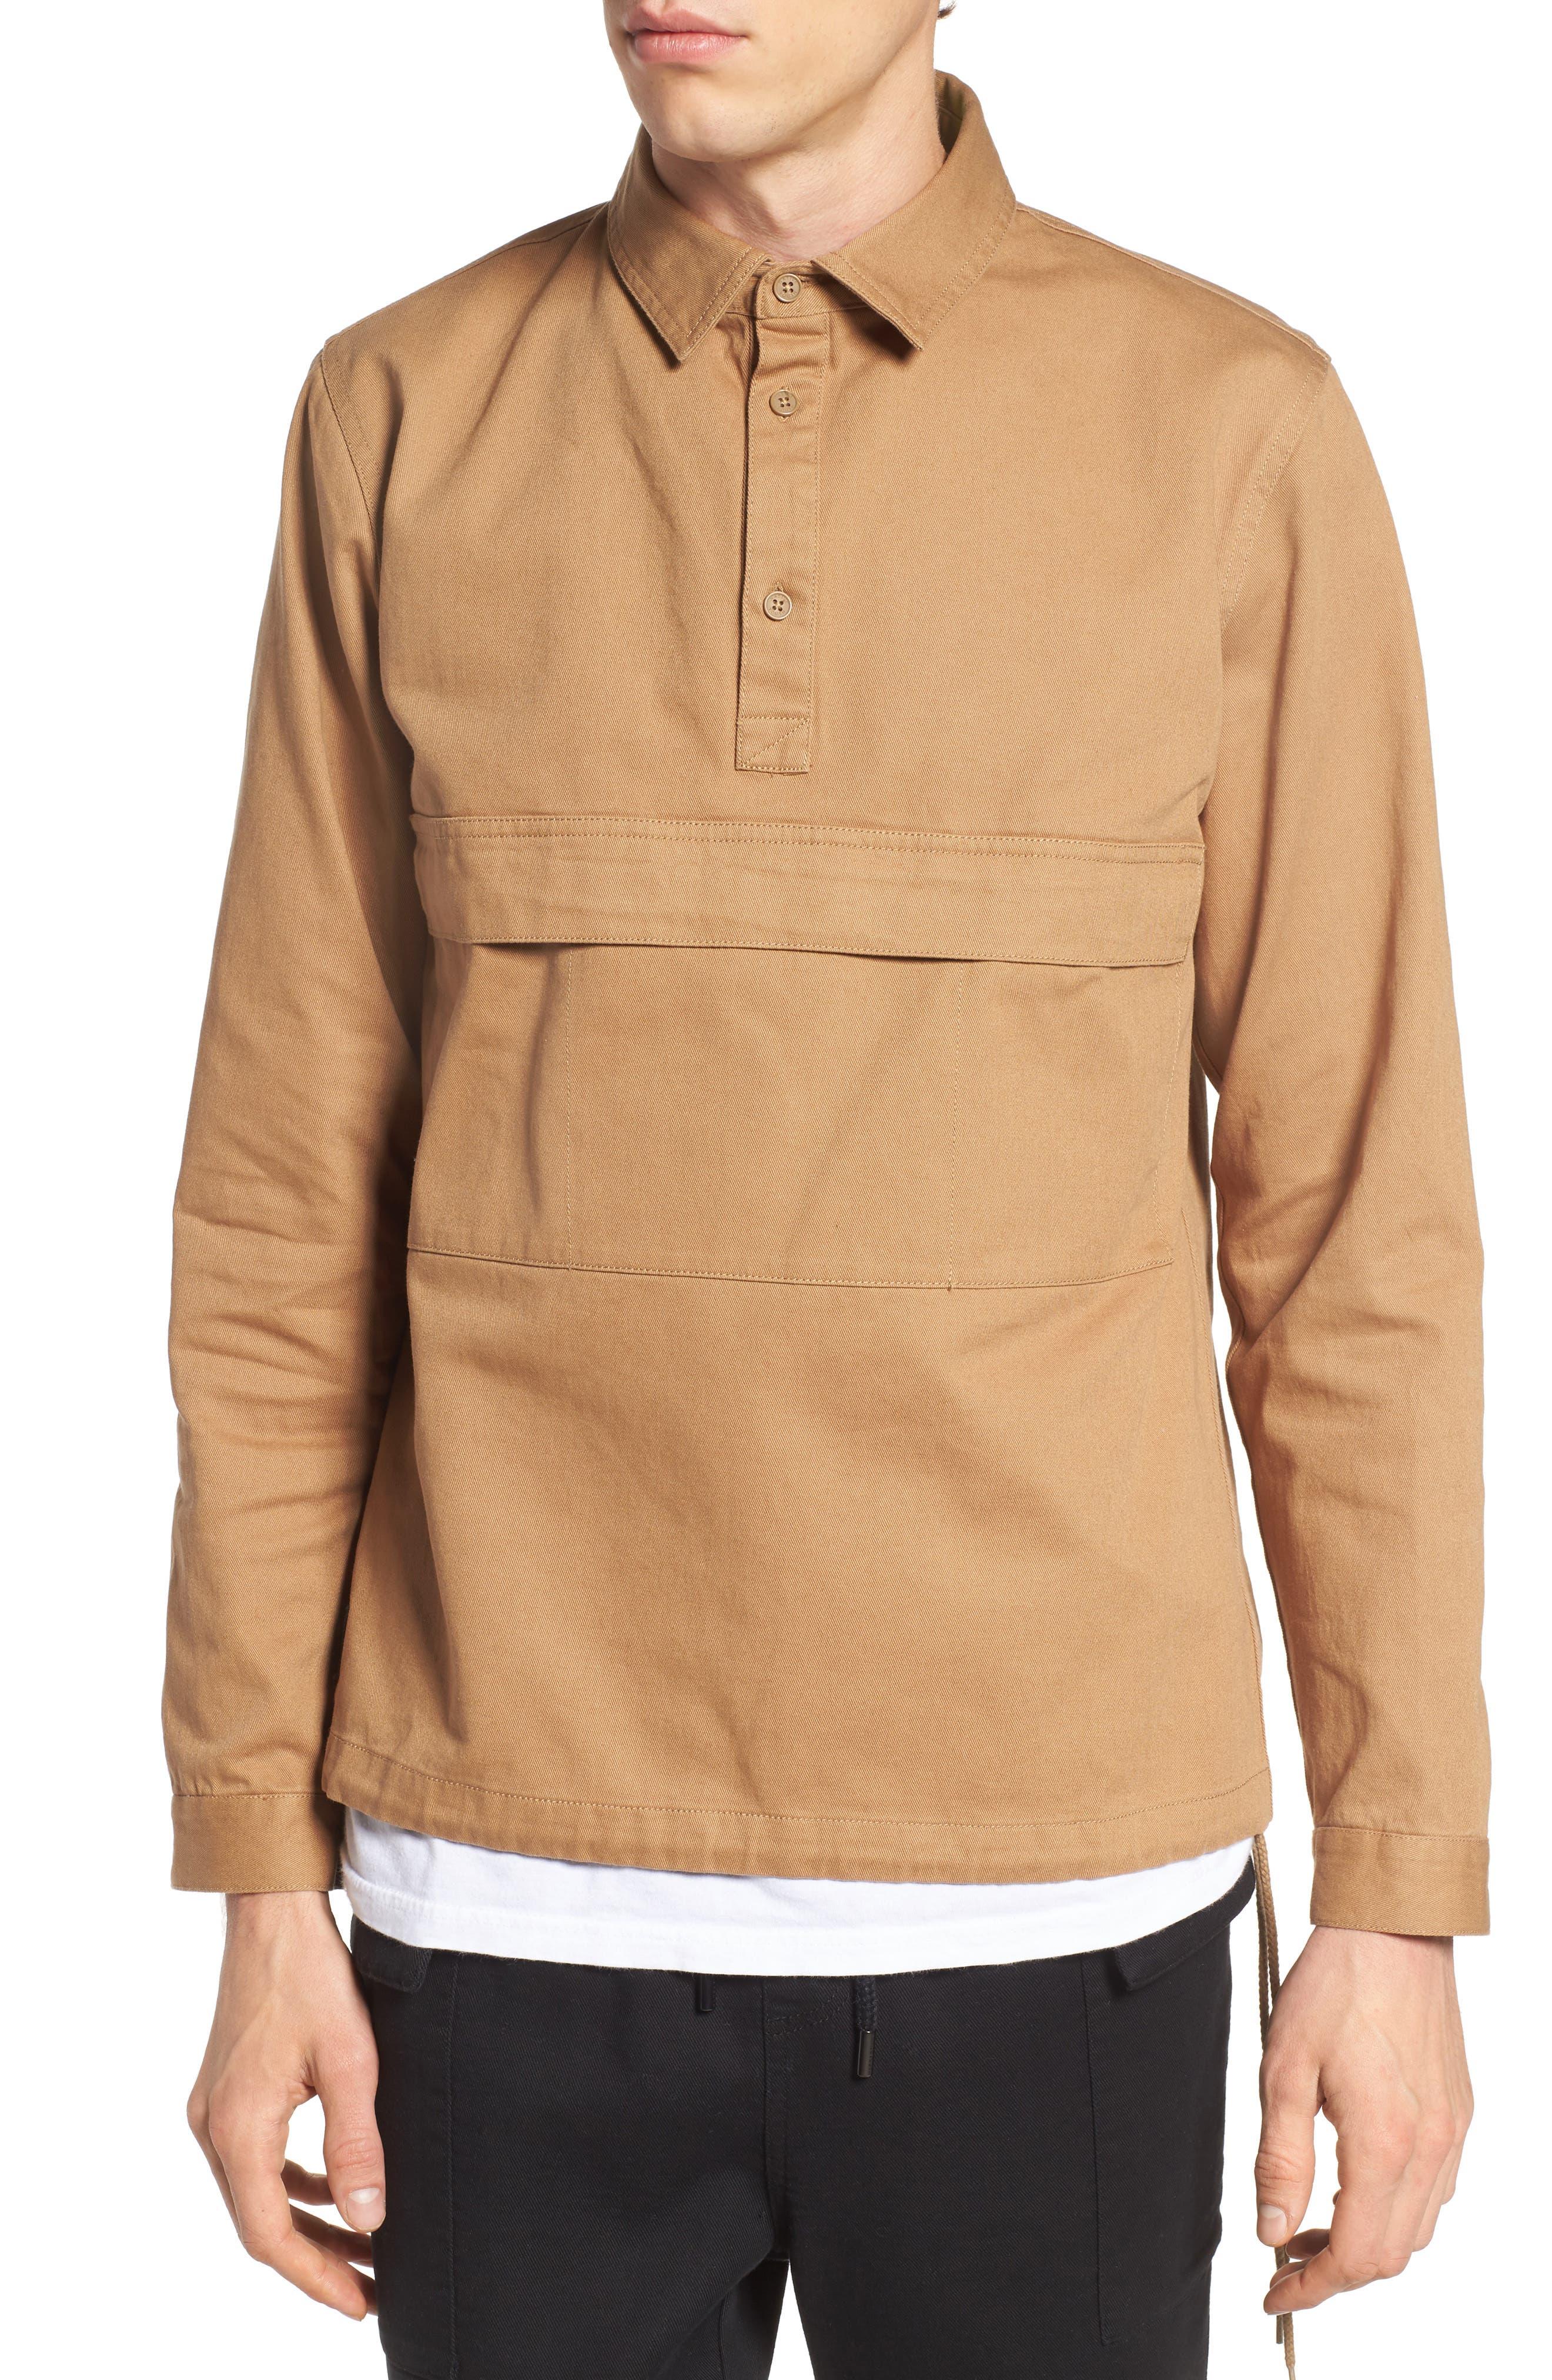 Woodside Twill Shirt,                             Main thumbnail 1, color,                             250